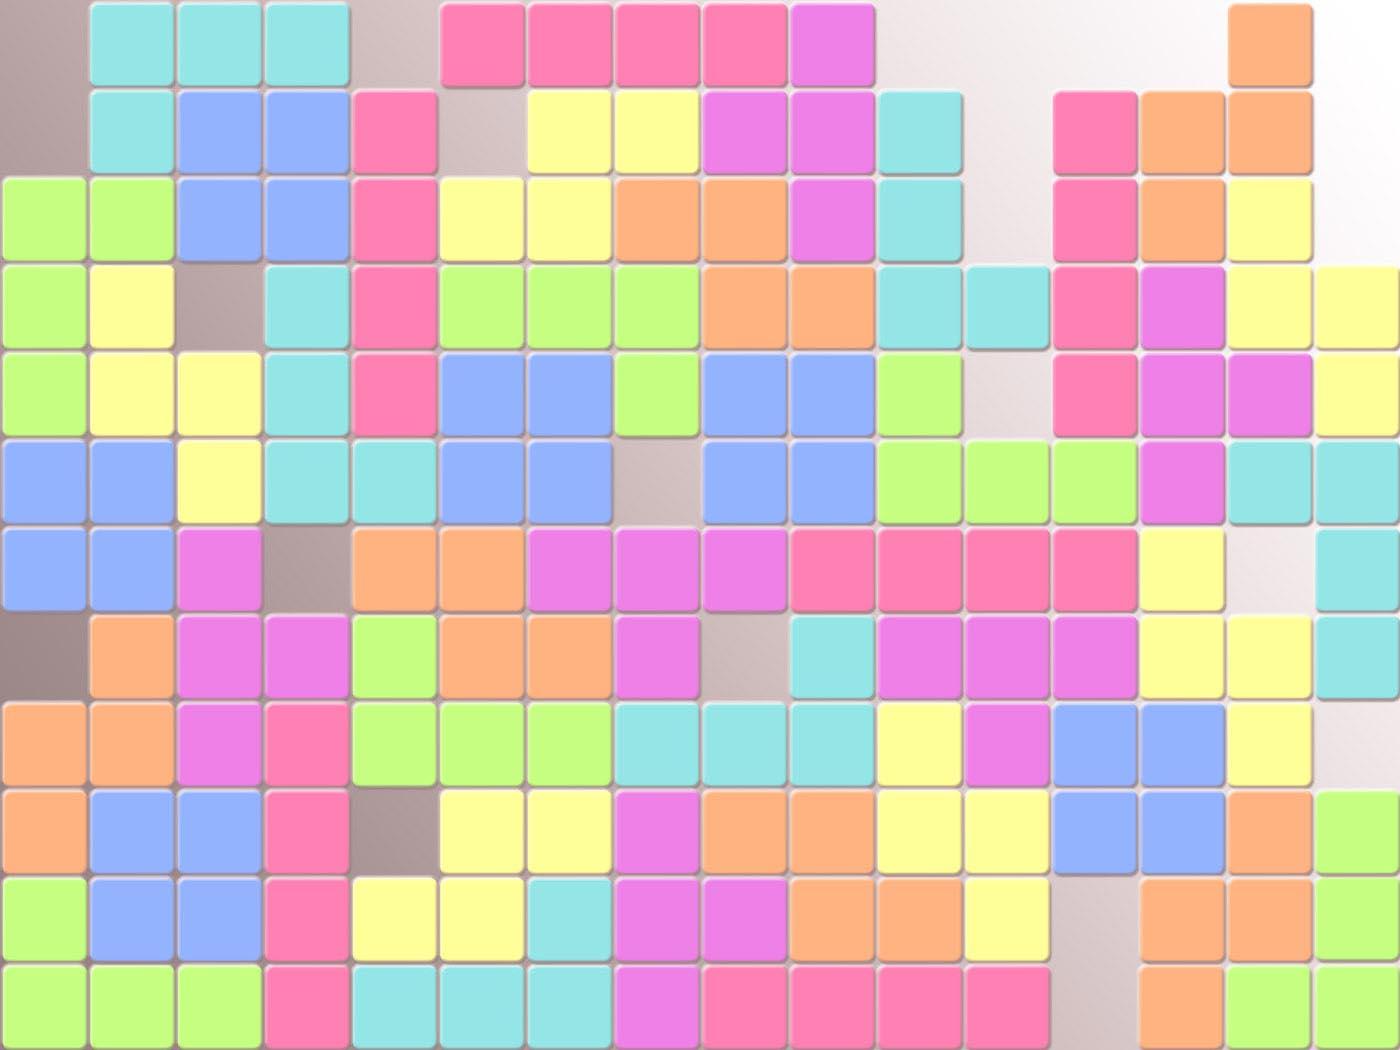 kostenlos tetris download